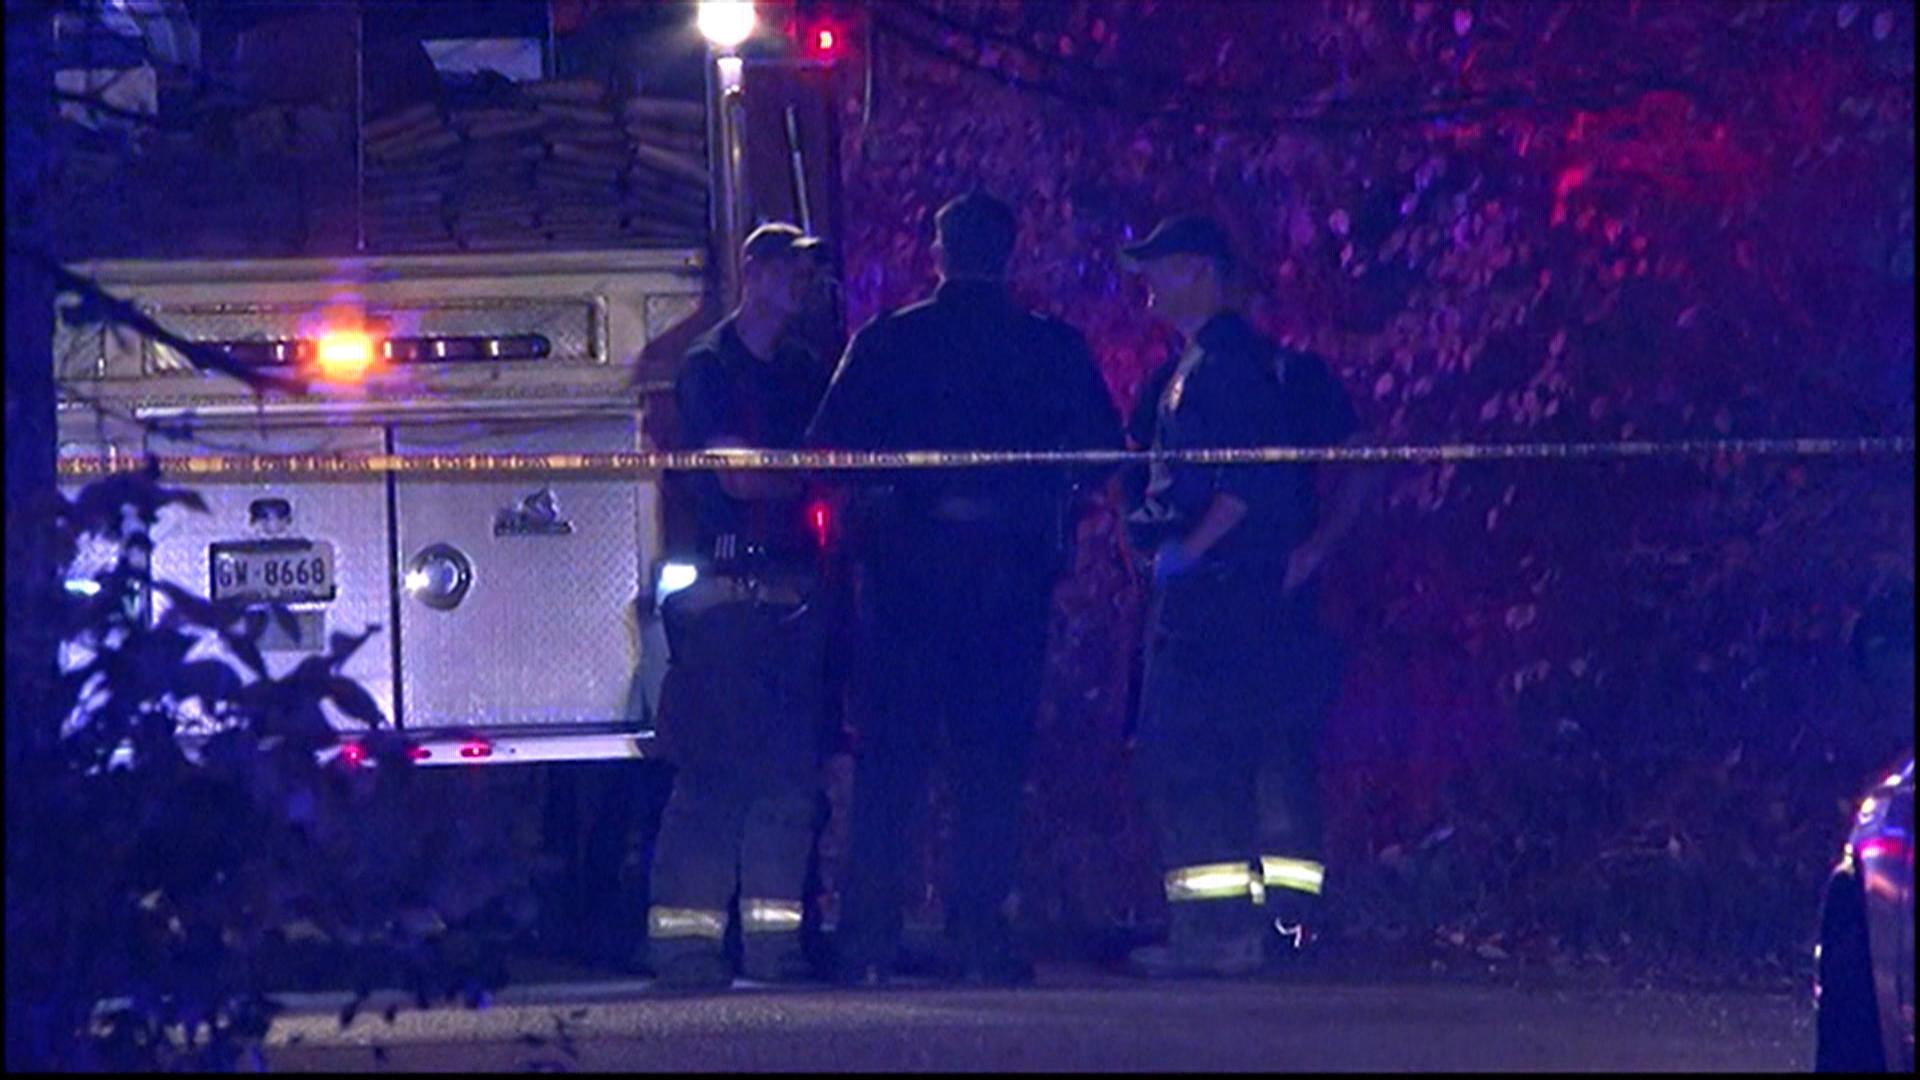 Night lights james dobson - Tennessee Teen Zaevion Dobson Dies Shielding Friends From Gunshots Police Nbc News